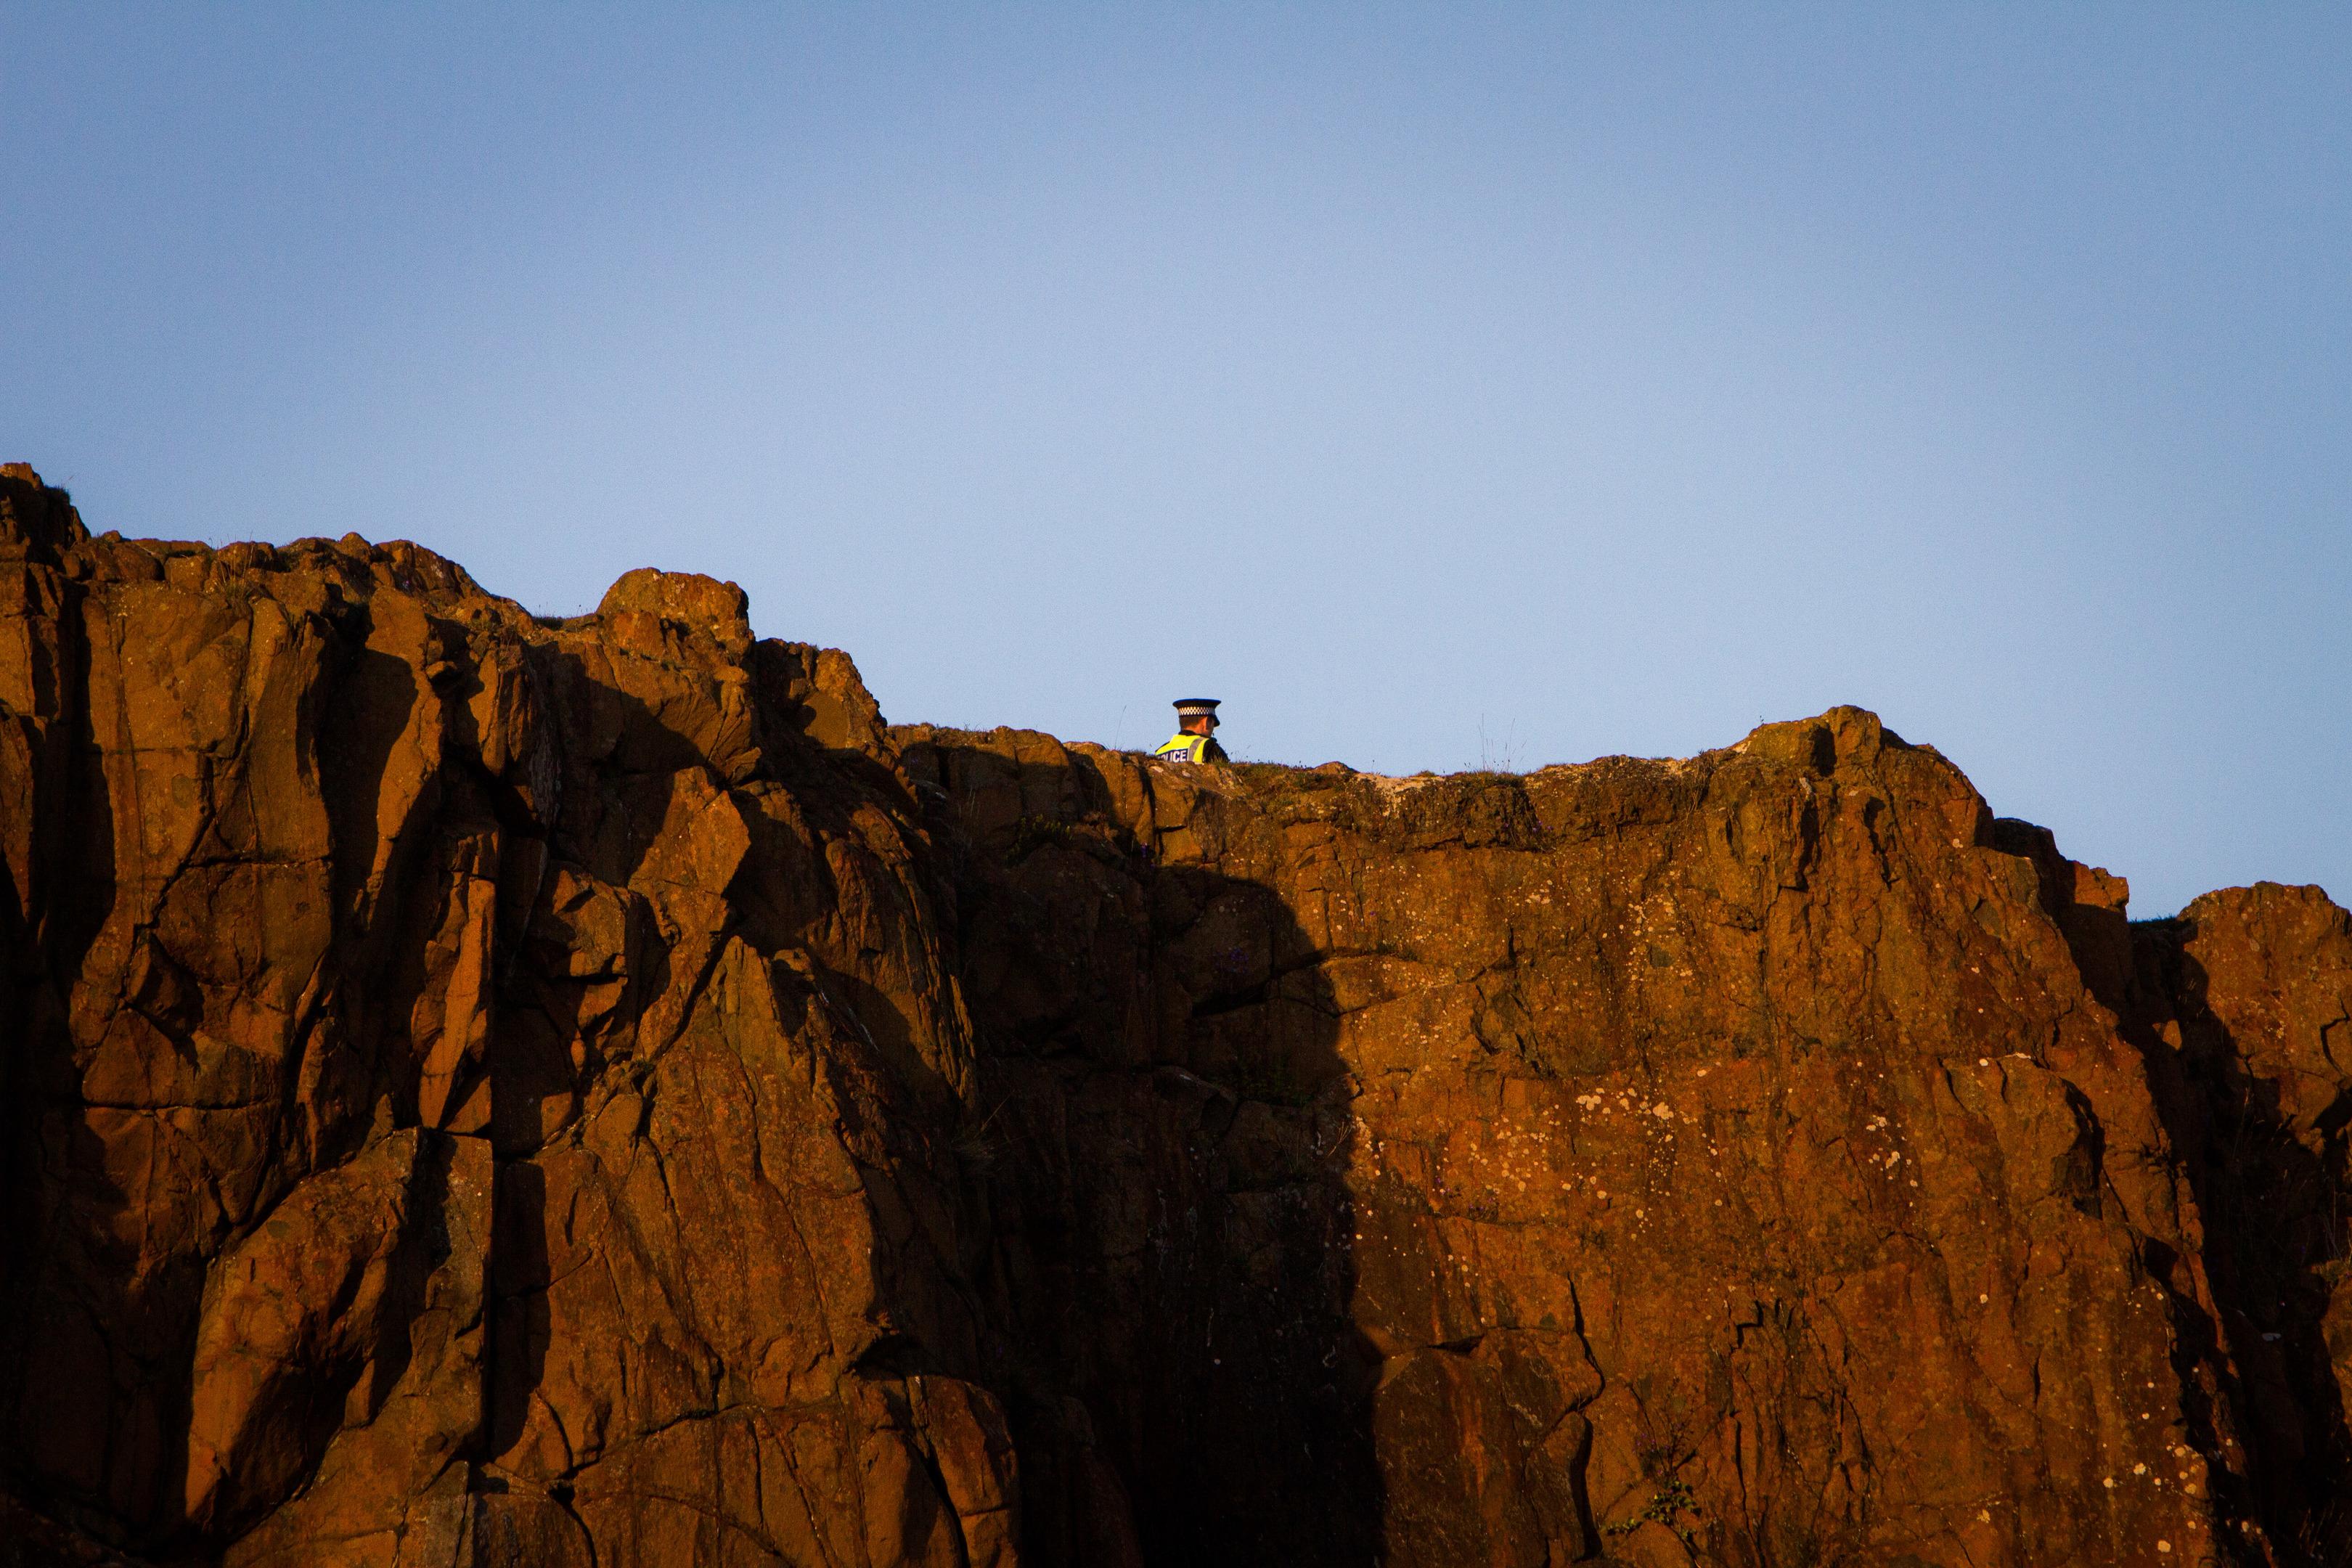 Aberdour cliffs (library photo)